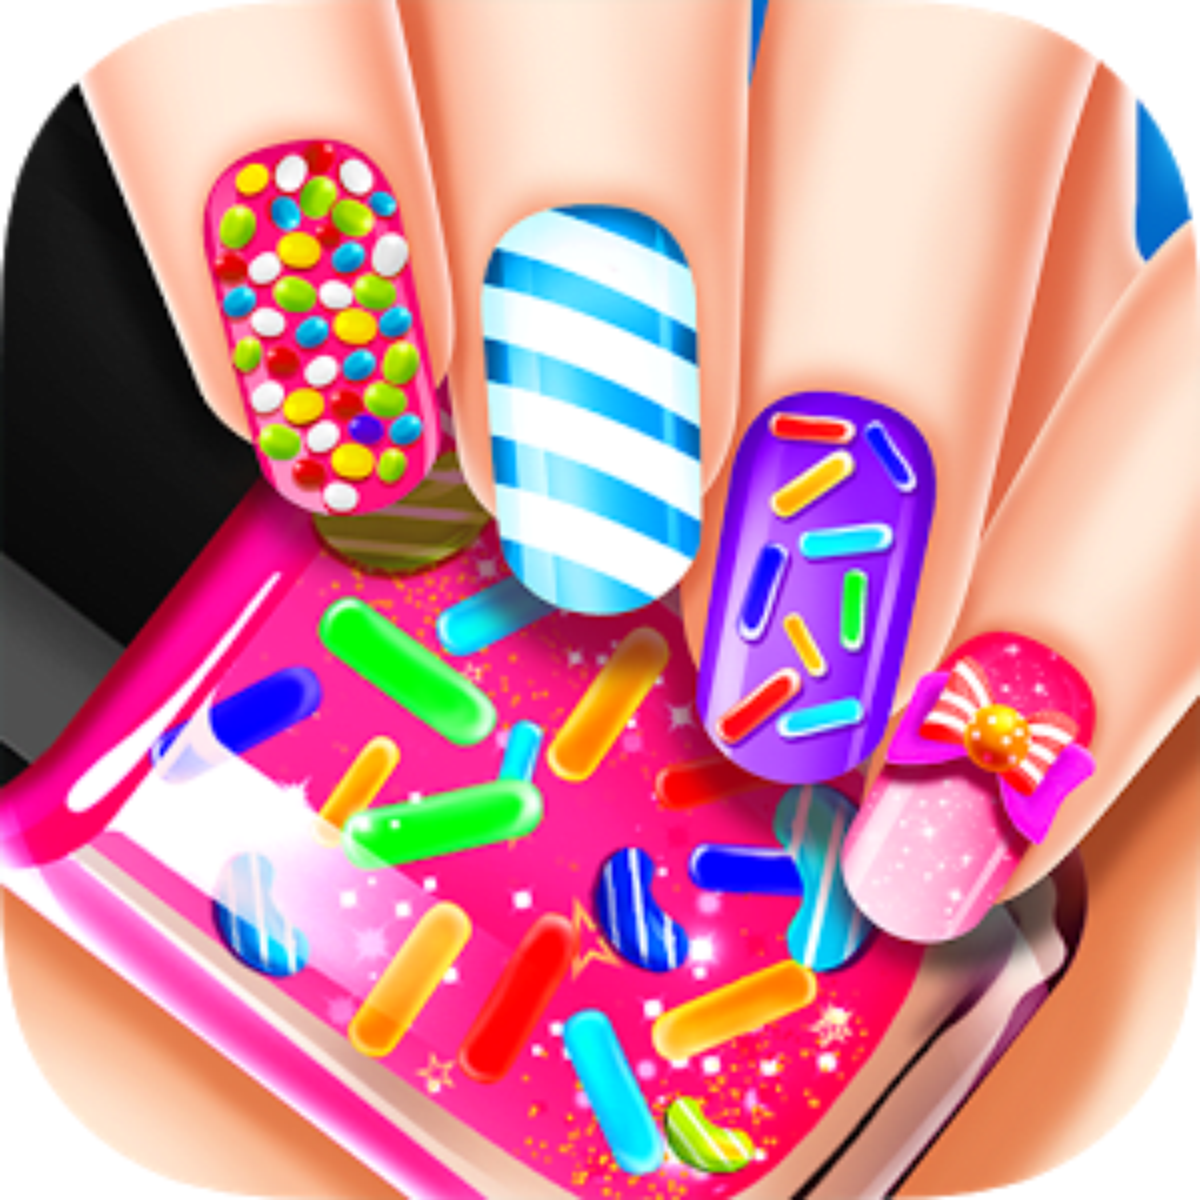 Magic Beauty Candy Nails Salon 1.0